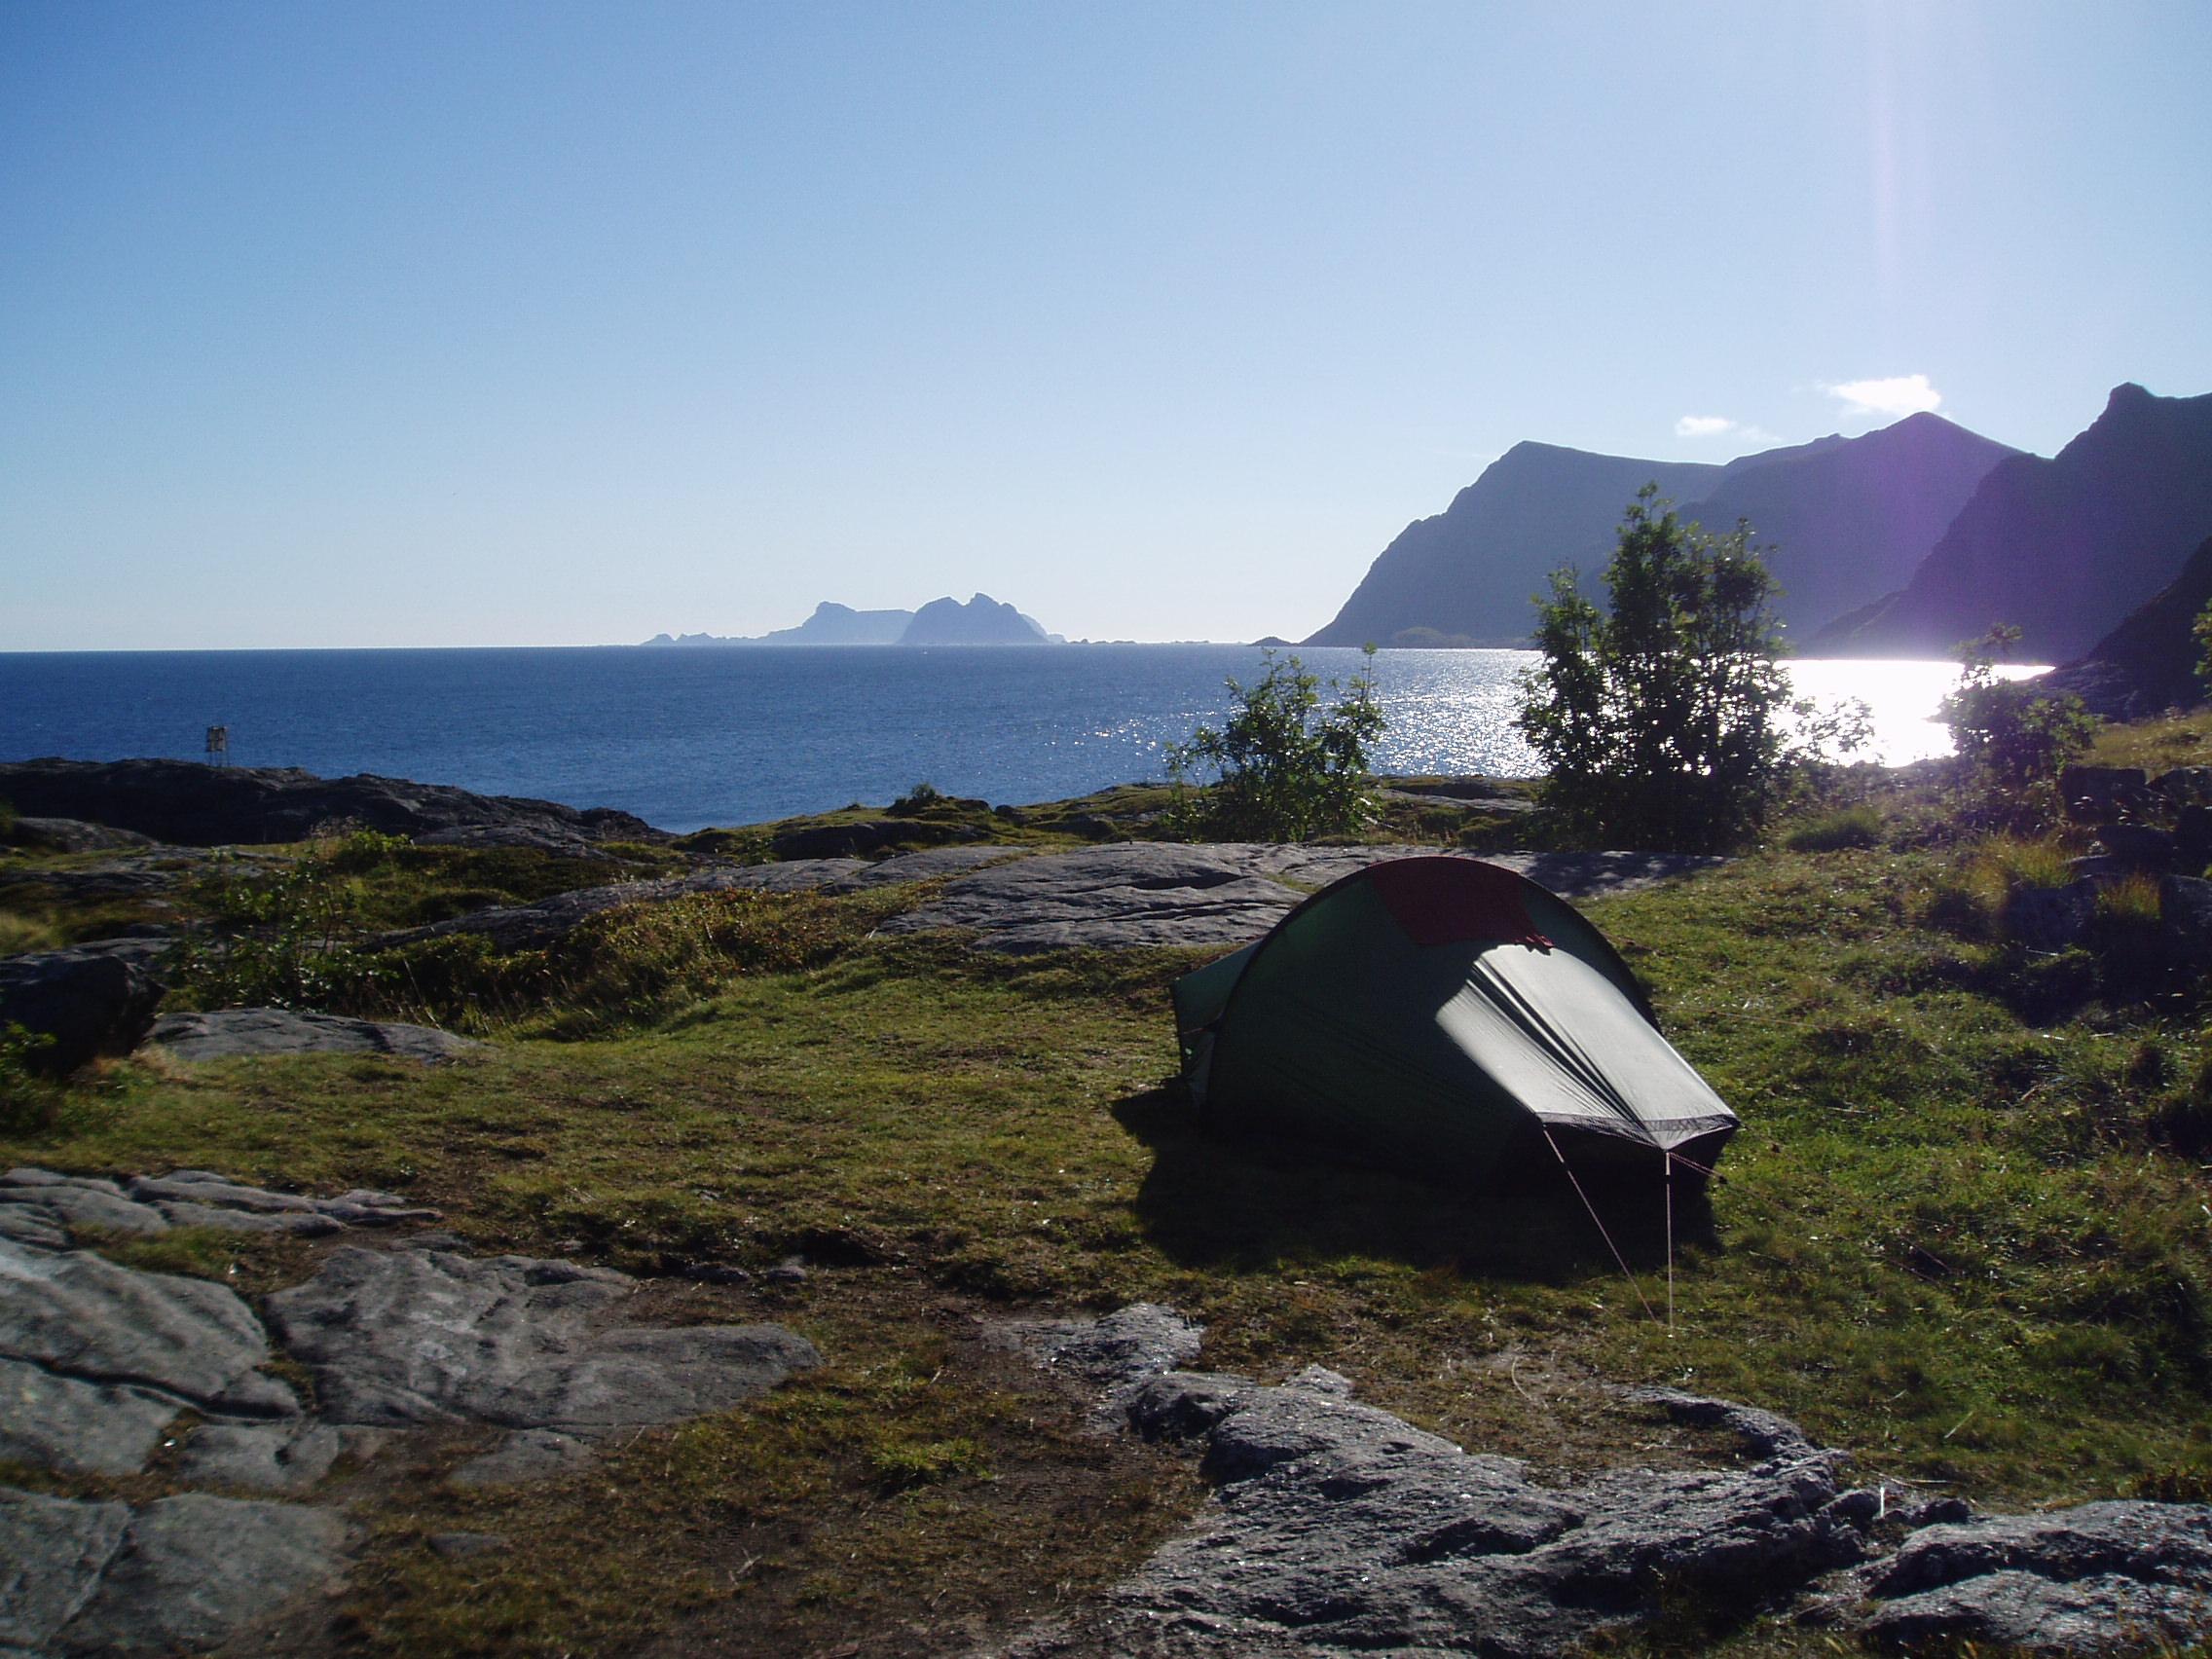 24 Wallpaper Hd File Camping At 197 In The Lofoten Islands Norway Jpg